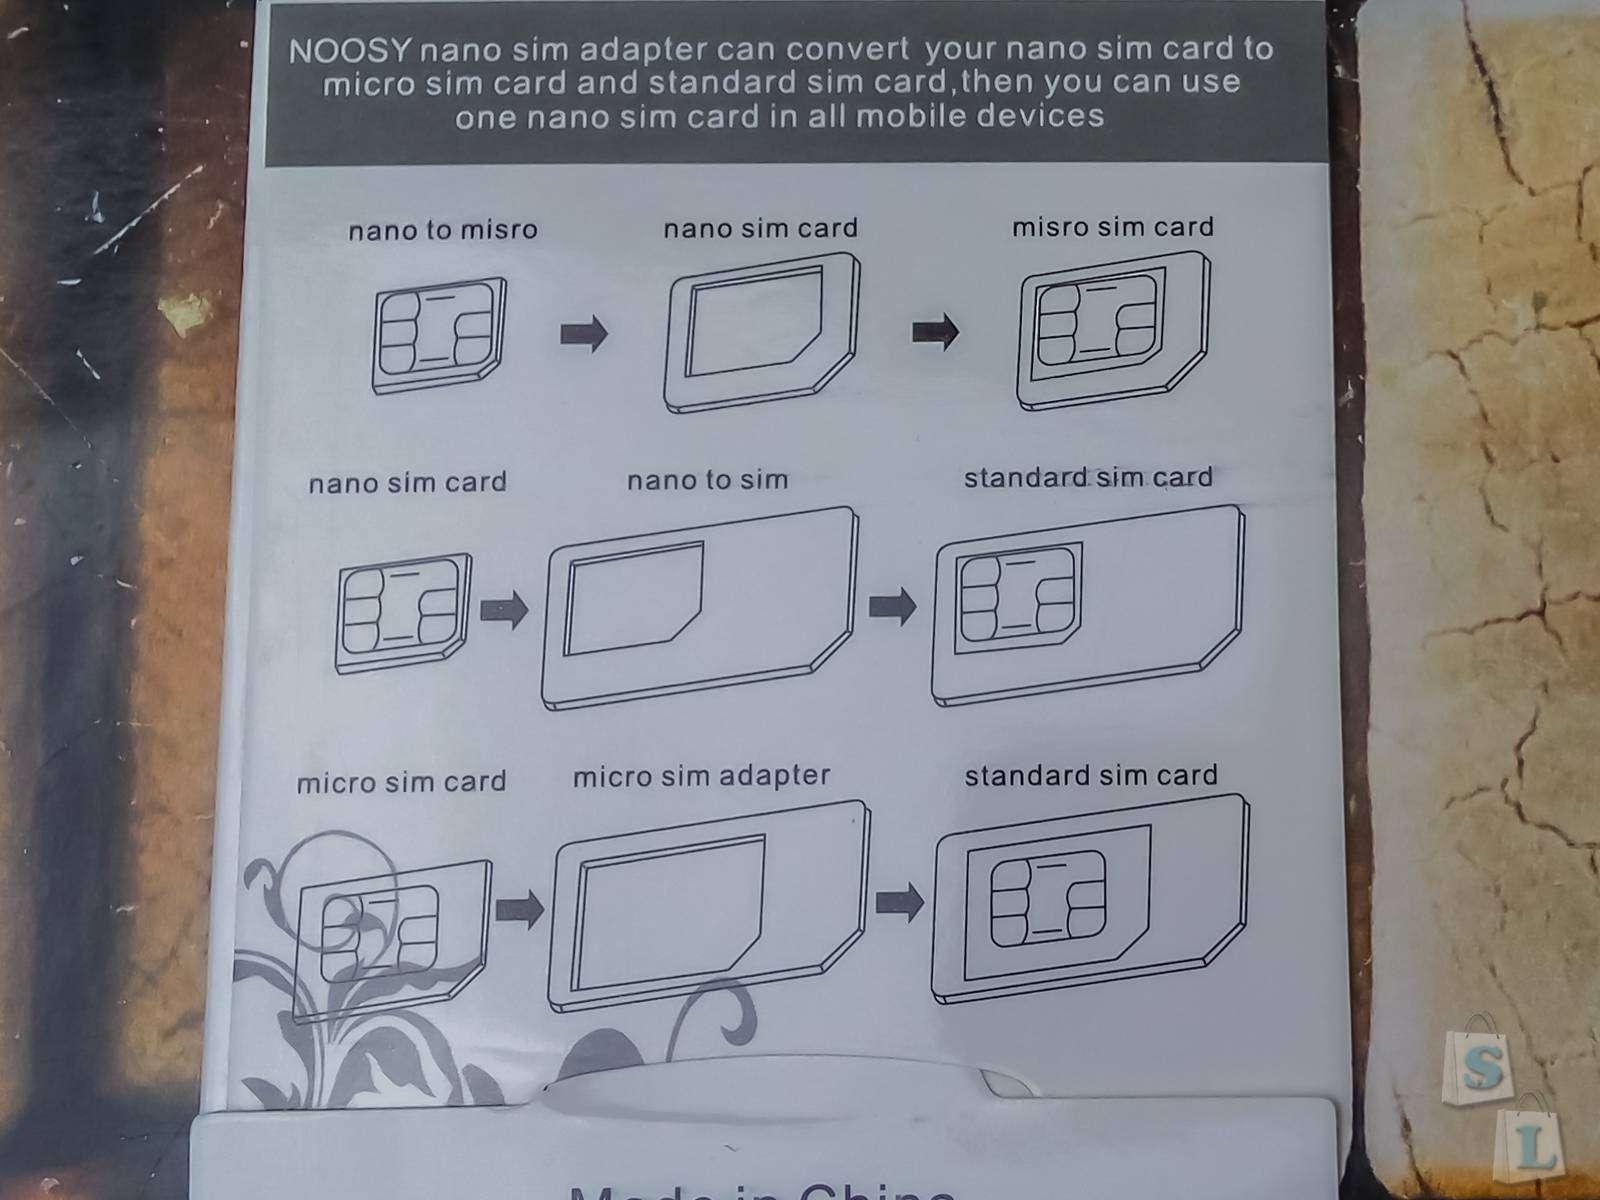 Aliexpress: Набор переходников для nano и micro Sim карт Noosy 4 в 1